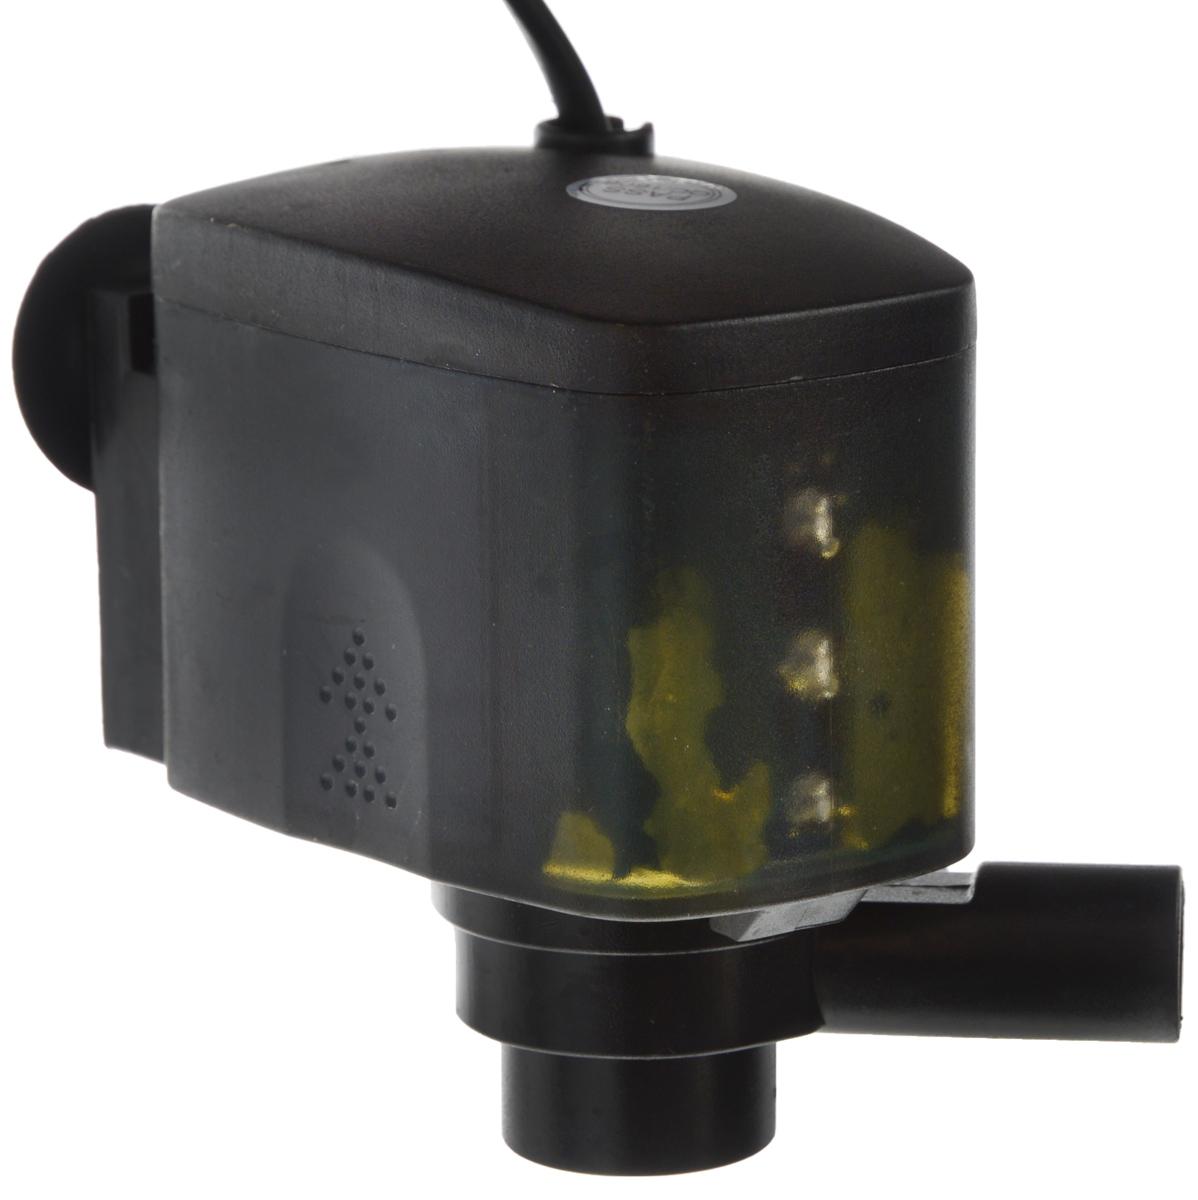 Помпа для аквариума Barbus LED-188, водяная, с индикаторами LED, 1200 л/ч, 20 Вт светильник для аквариума aqualighter pico soft led гибкий корпус цвет розовый 10 л